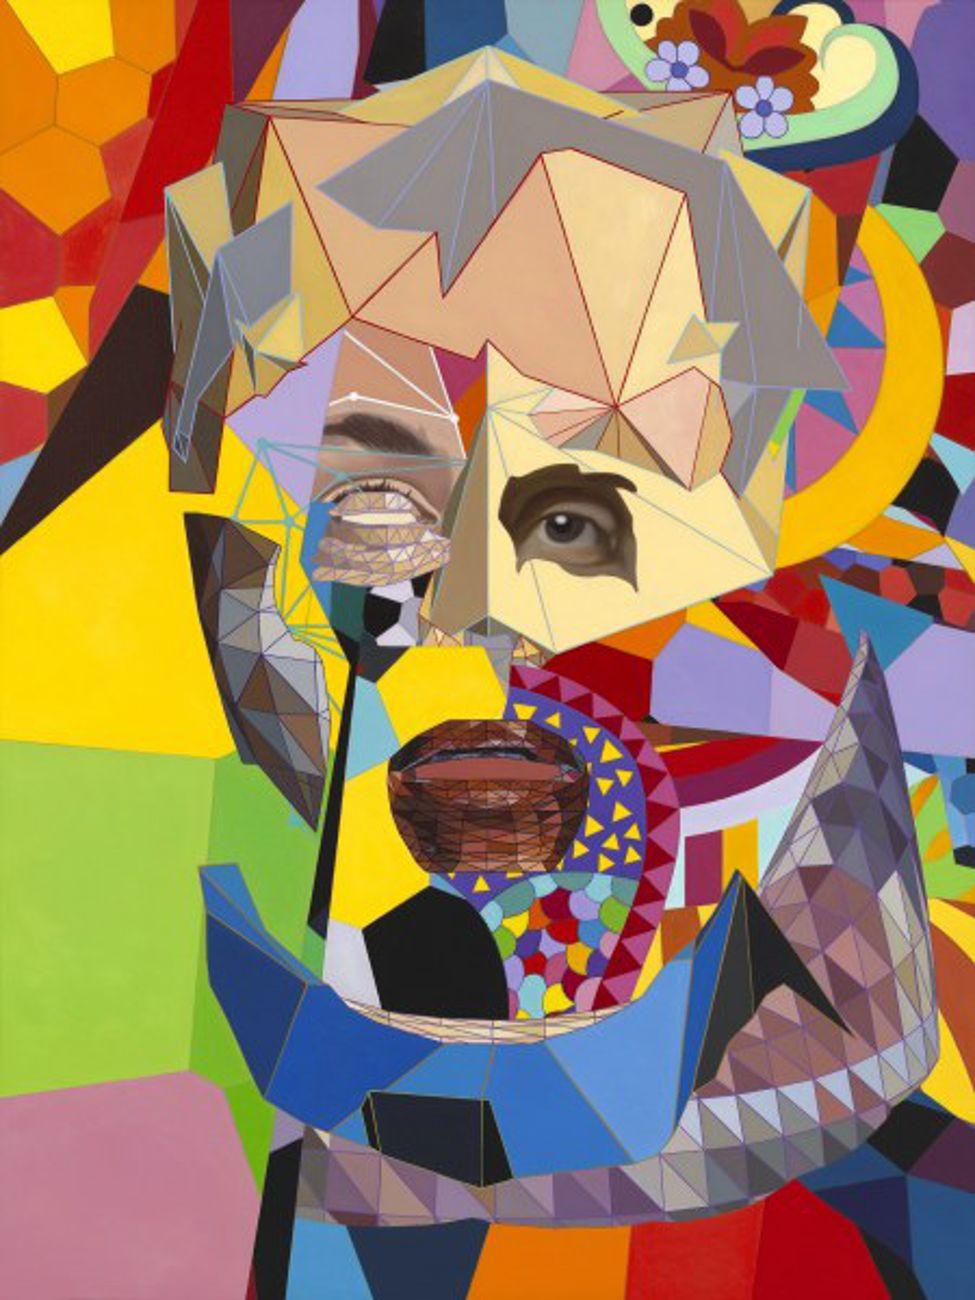 Ben Edwards, Bot in Love, 2020, olio su tela, 122.4 x 91.5 cm. Photo Old Town Editions in Alexandria, Virginia. Courtesy Mucciaccia Contemporary, Roma